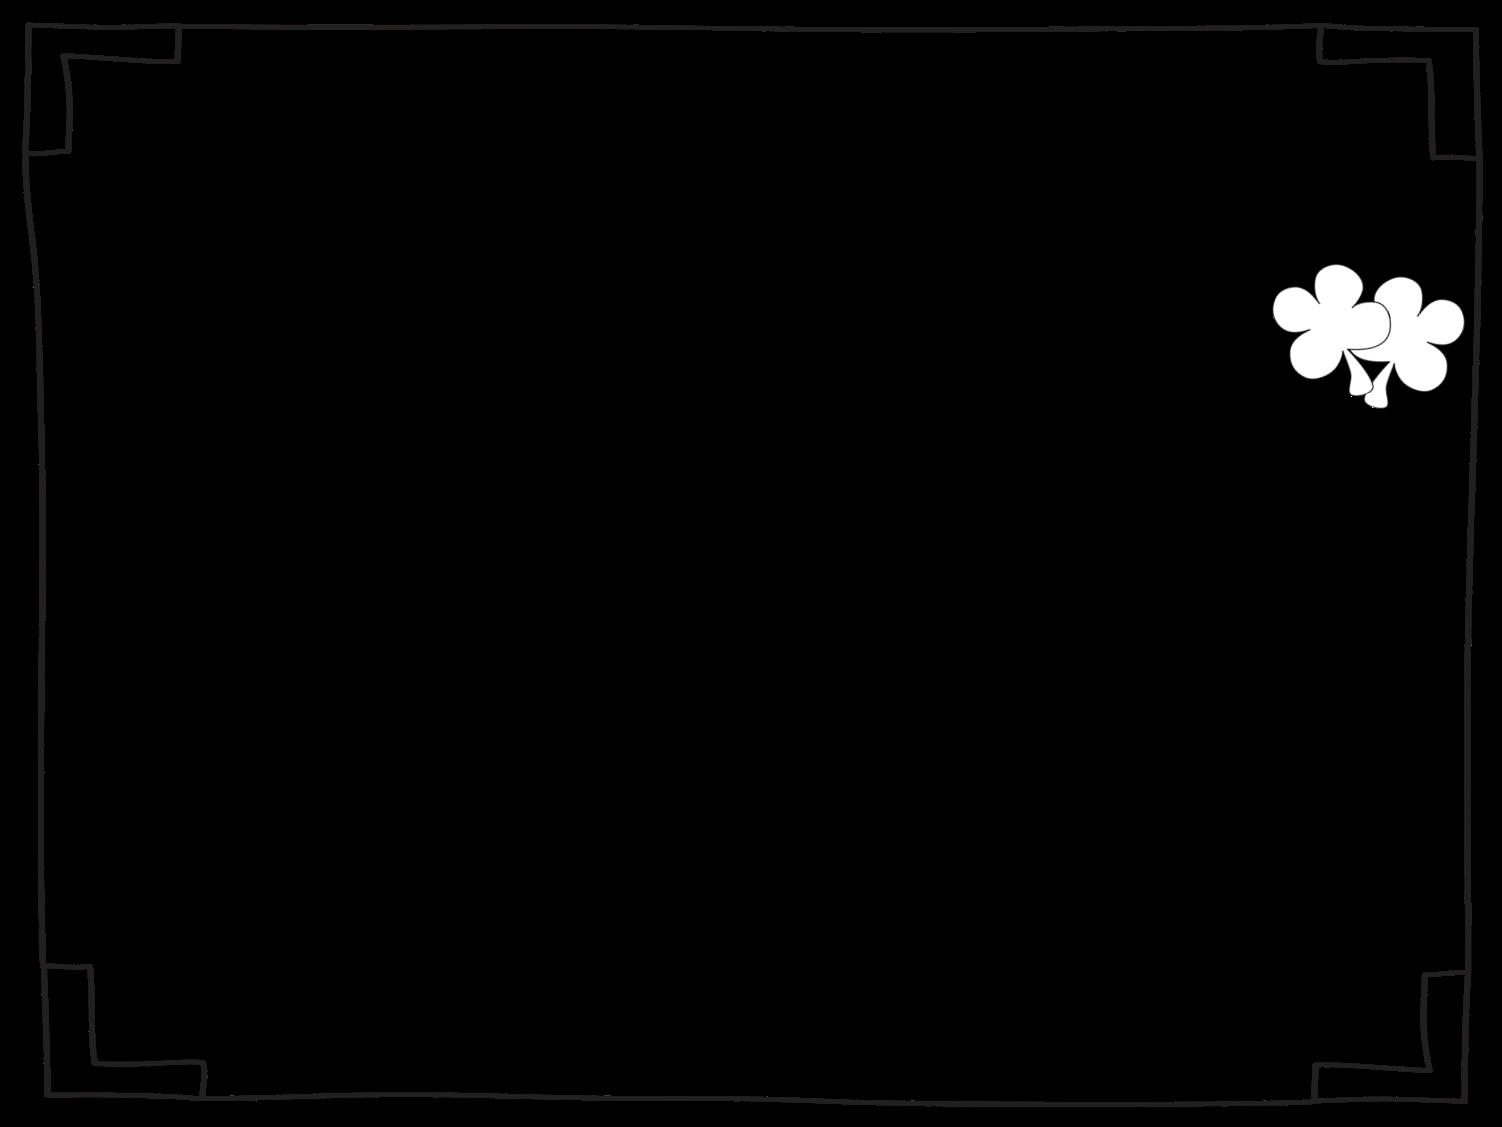 Worksheet Printable 1st Grade Writing Paper Wosenly Free Worksheet – Free Printable Writing Paper